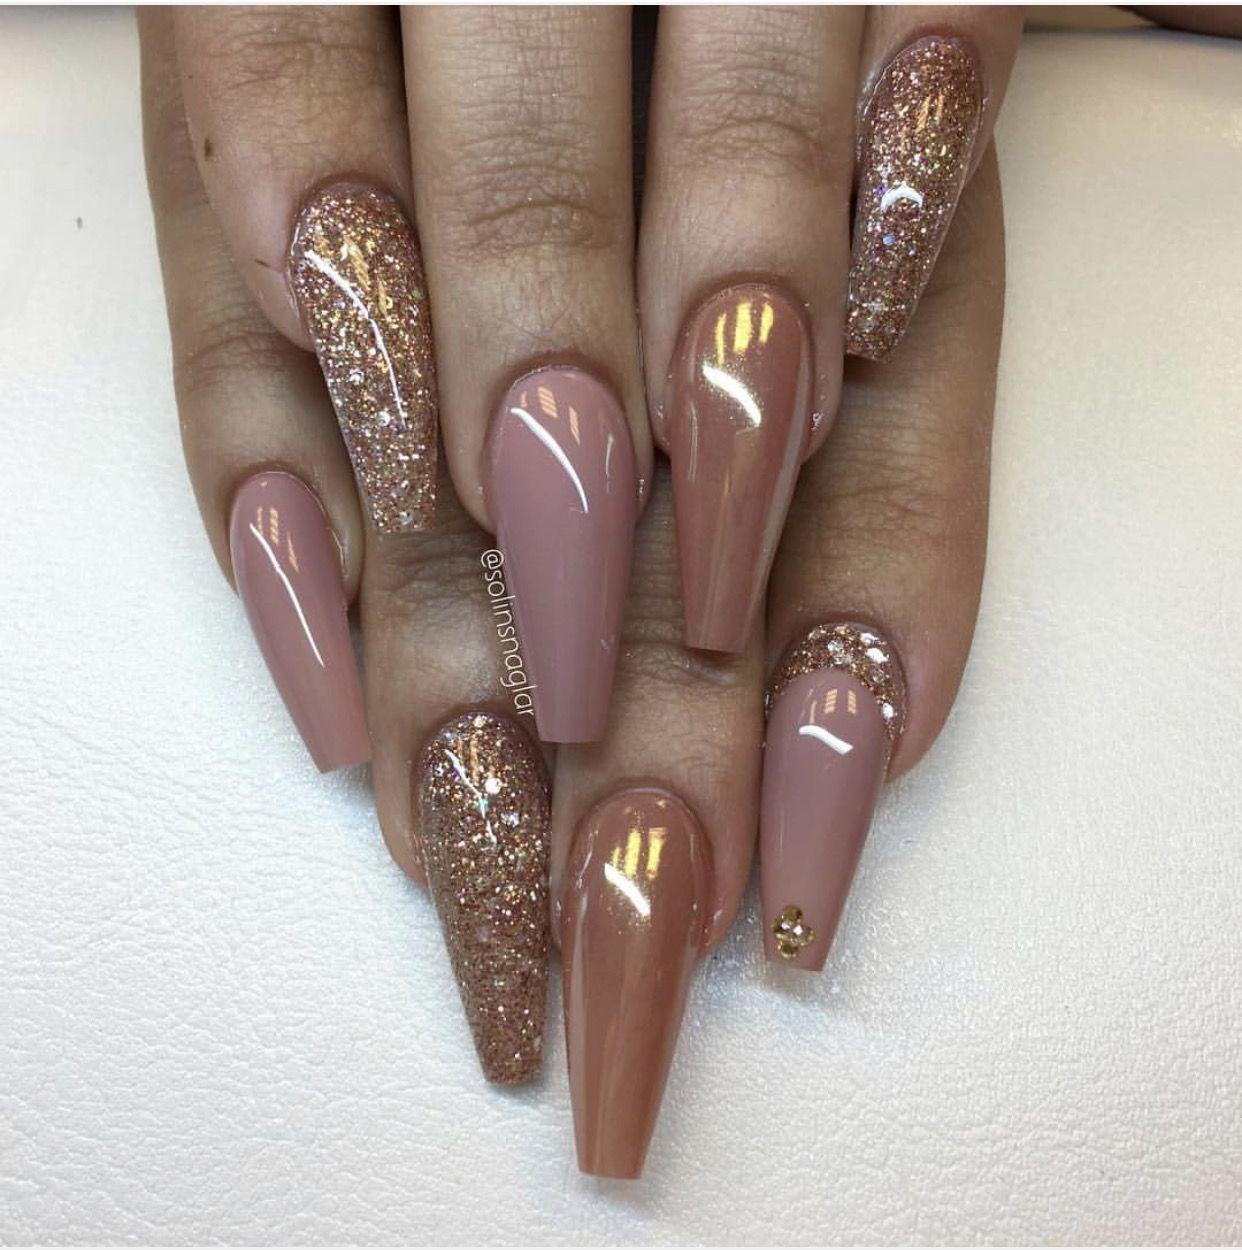 PINNED BY: @LOVEMEBEAUTY85 - Nails | Pinterest